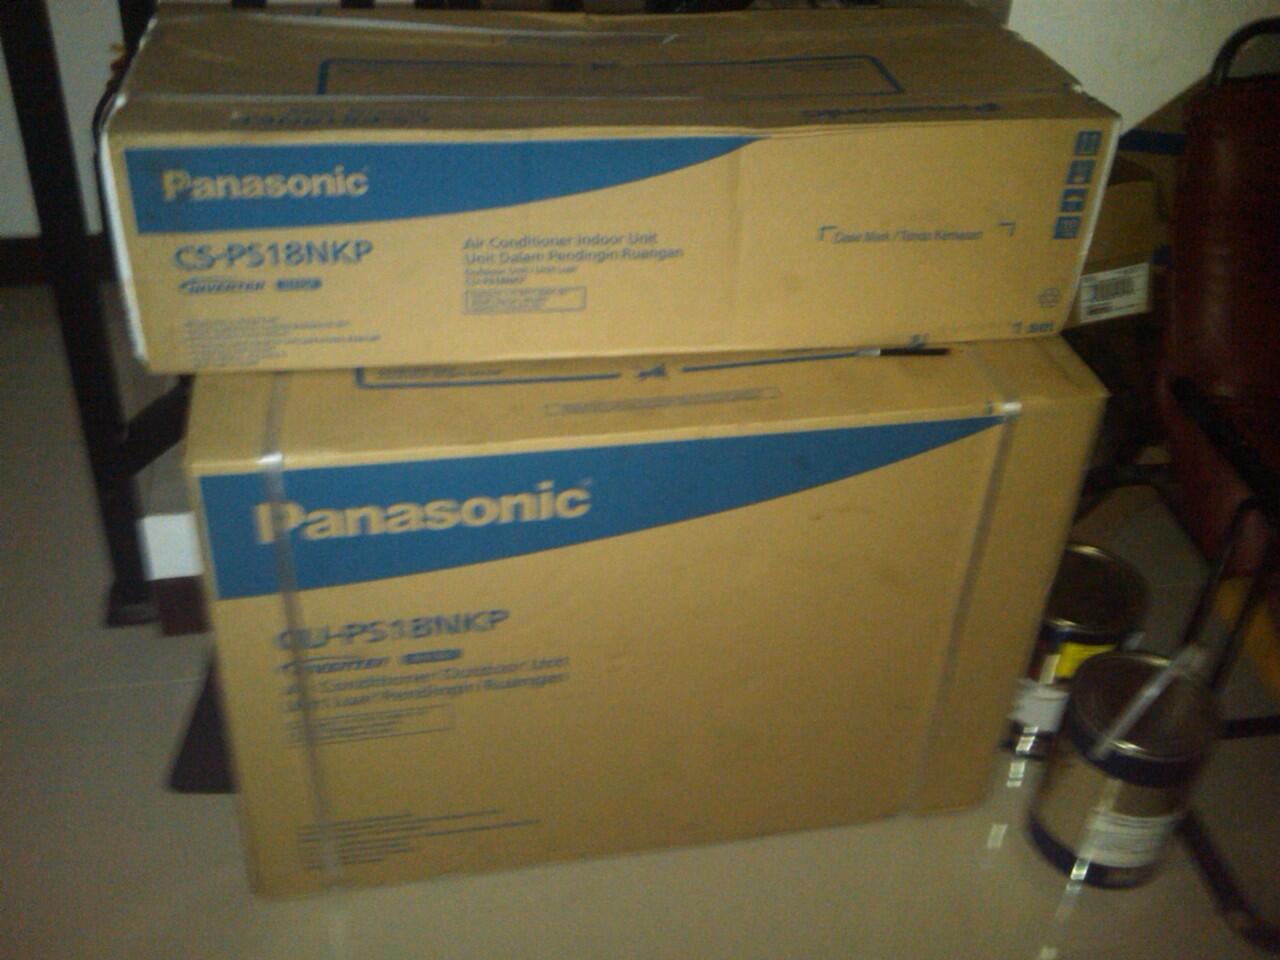 AC Panasonic INVERTER 2 PK : CS-PS18NKP